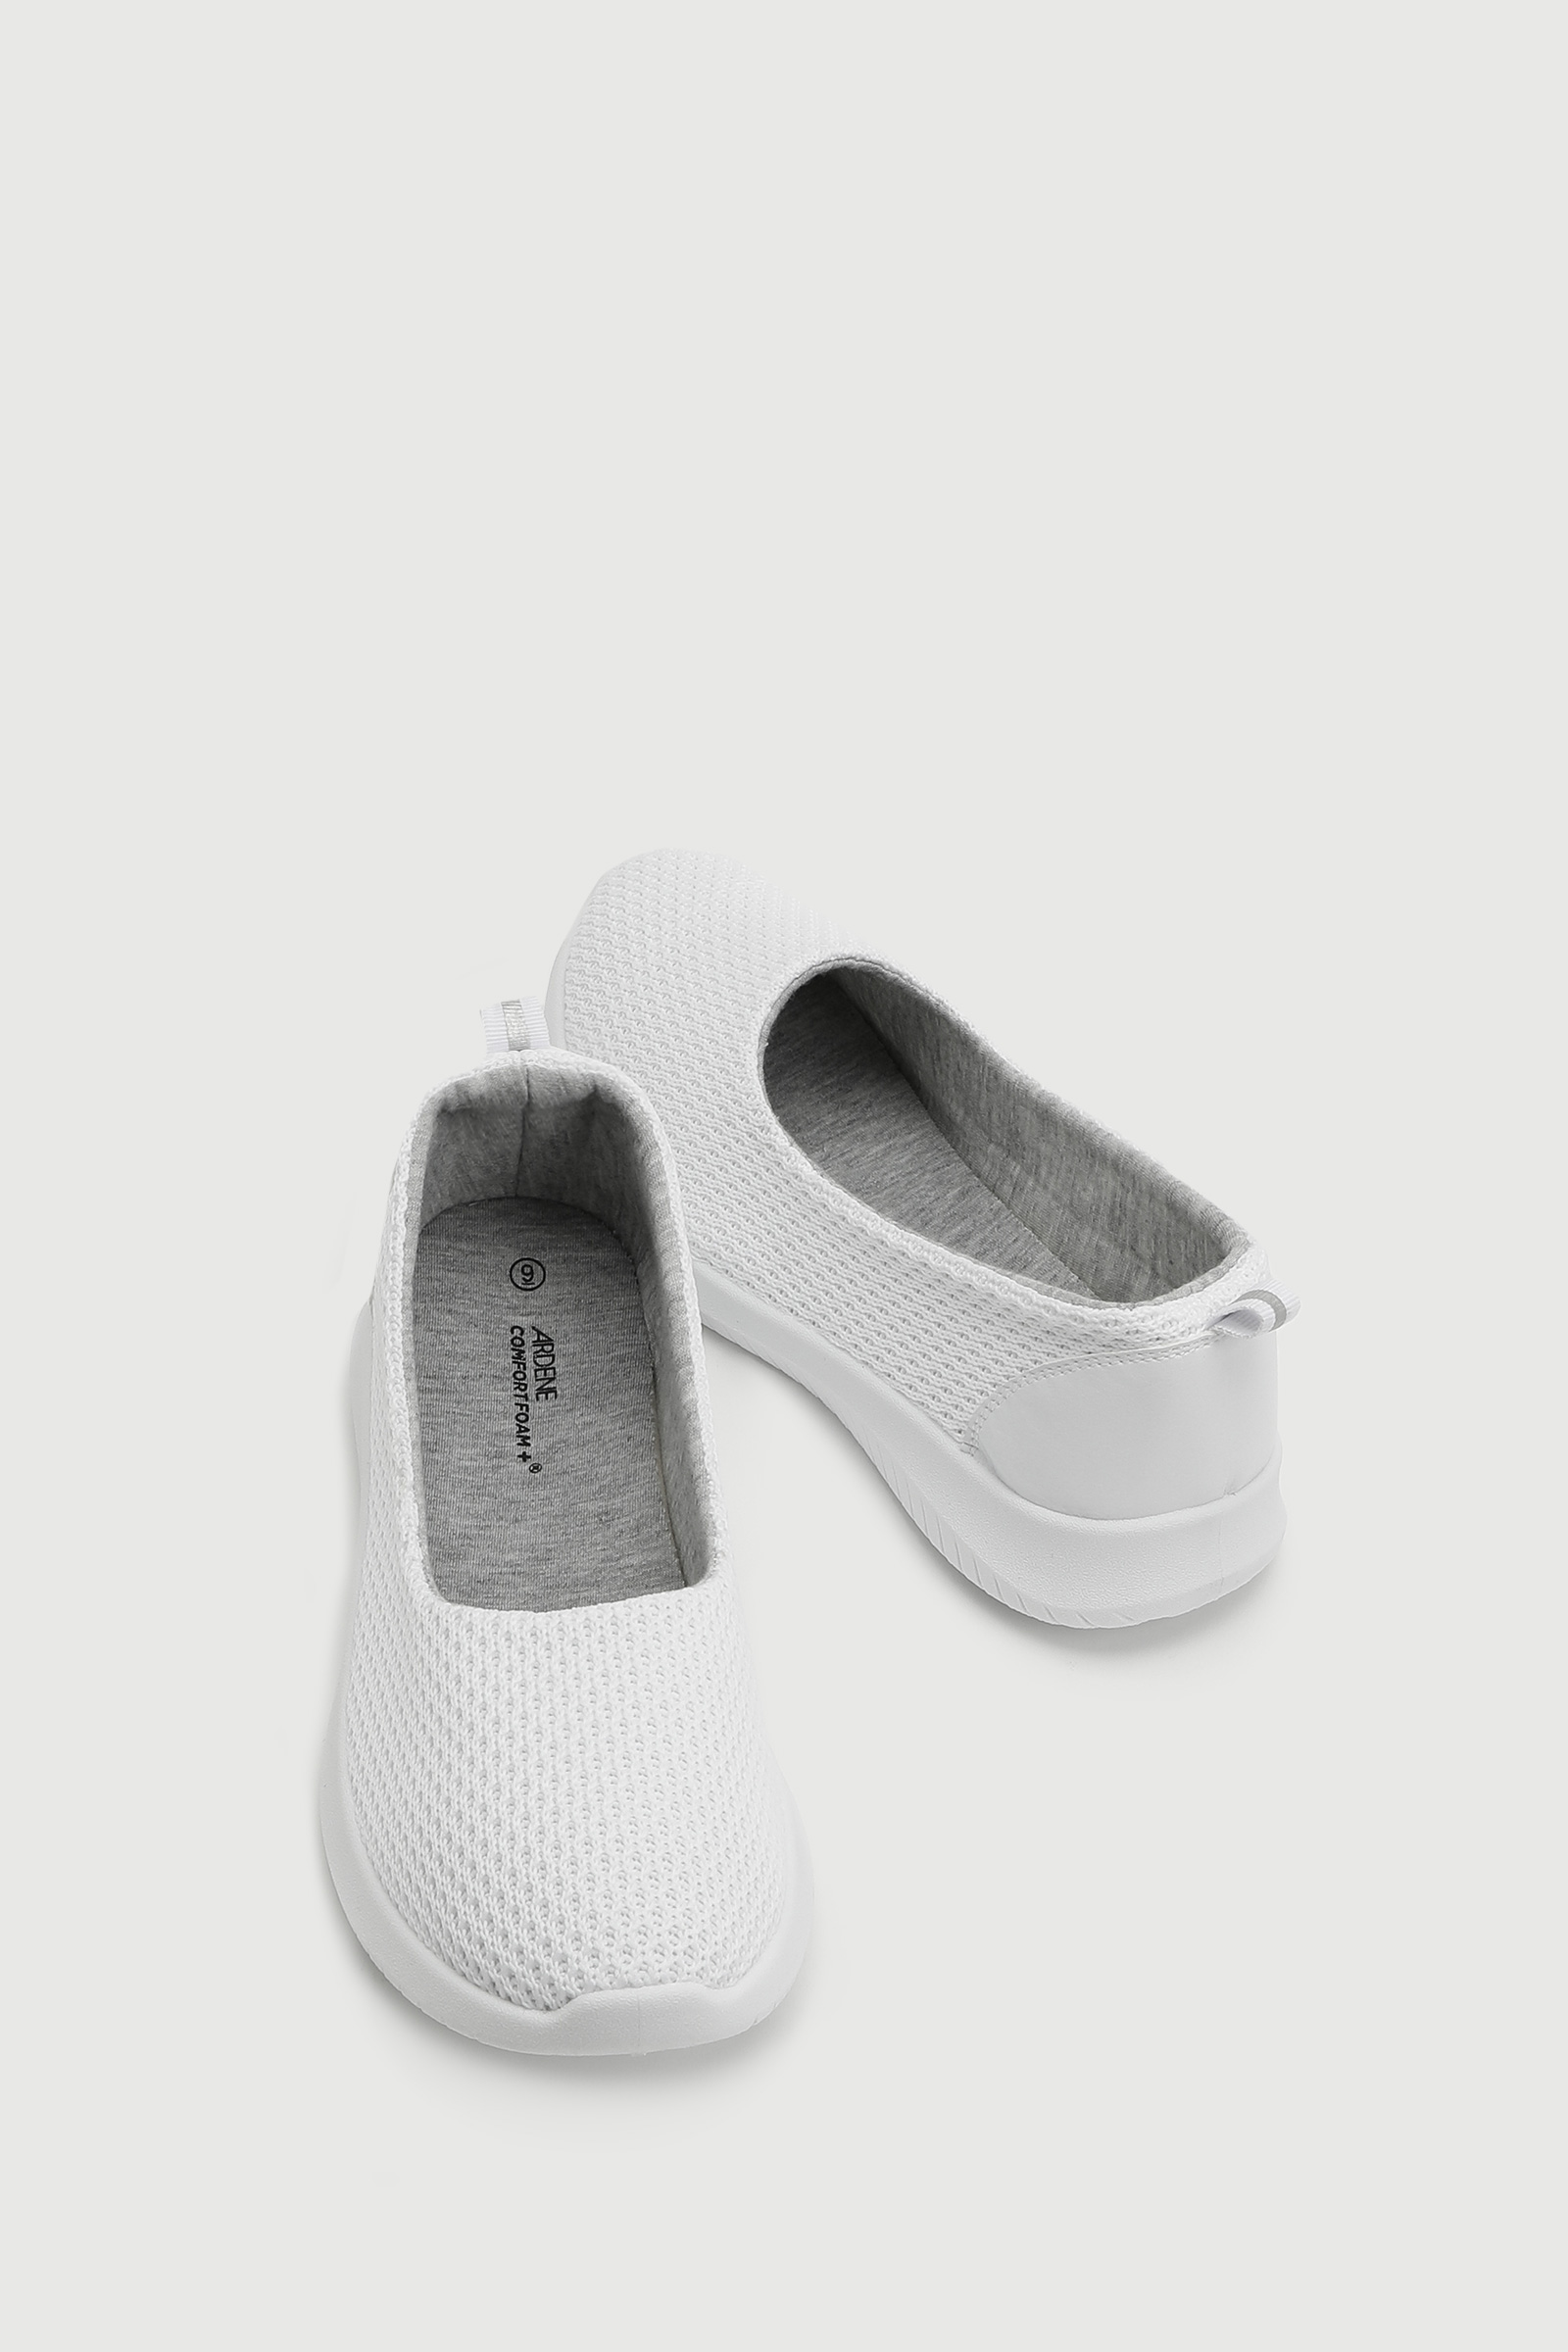 Mesh Knit Ballerina Sneakers